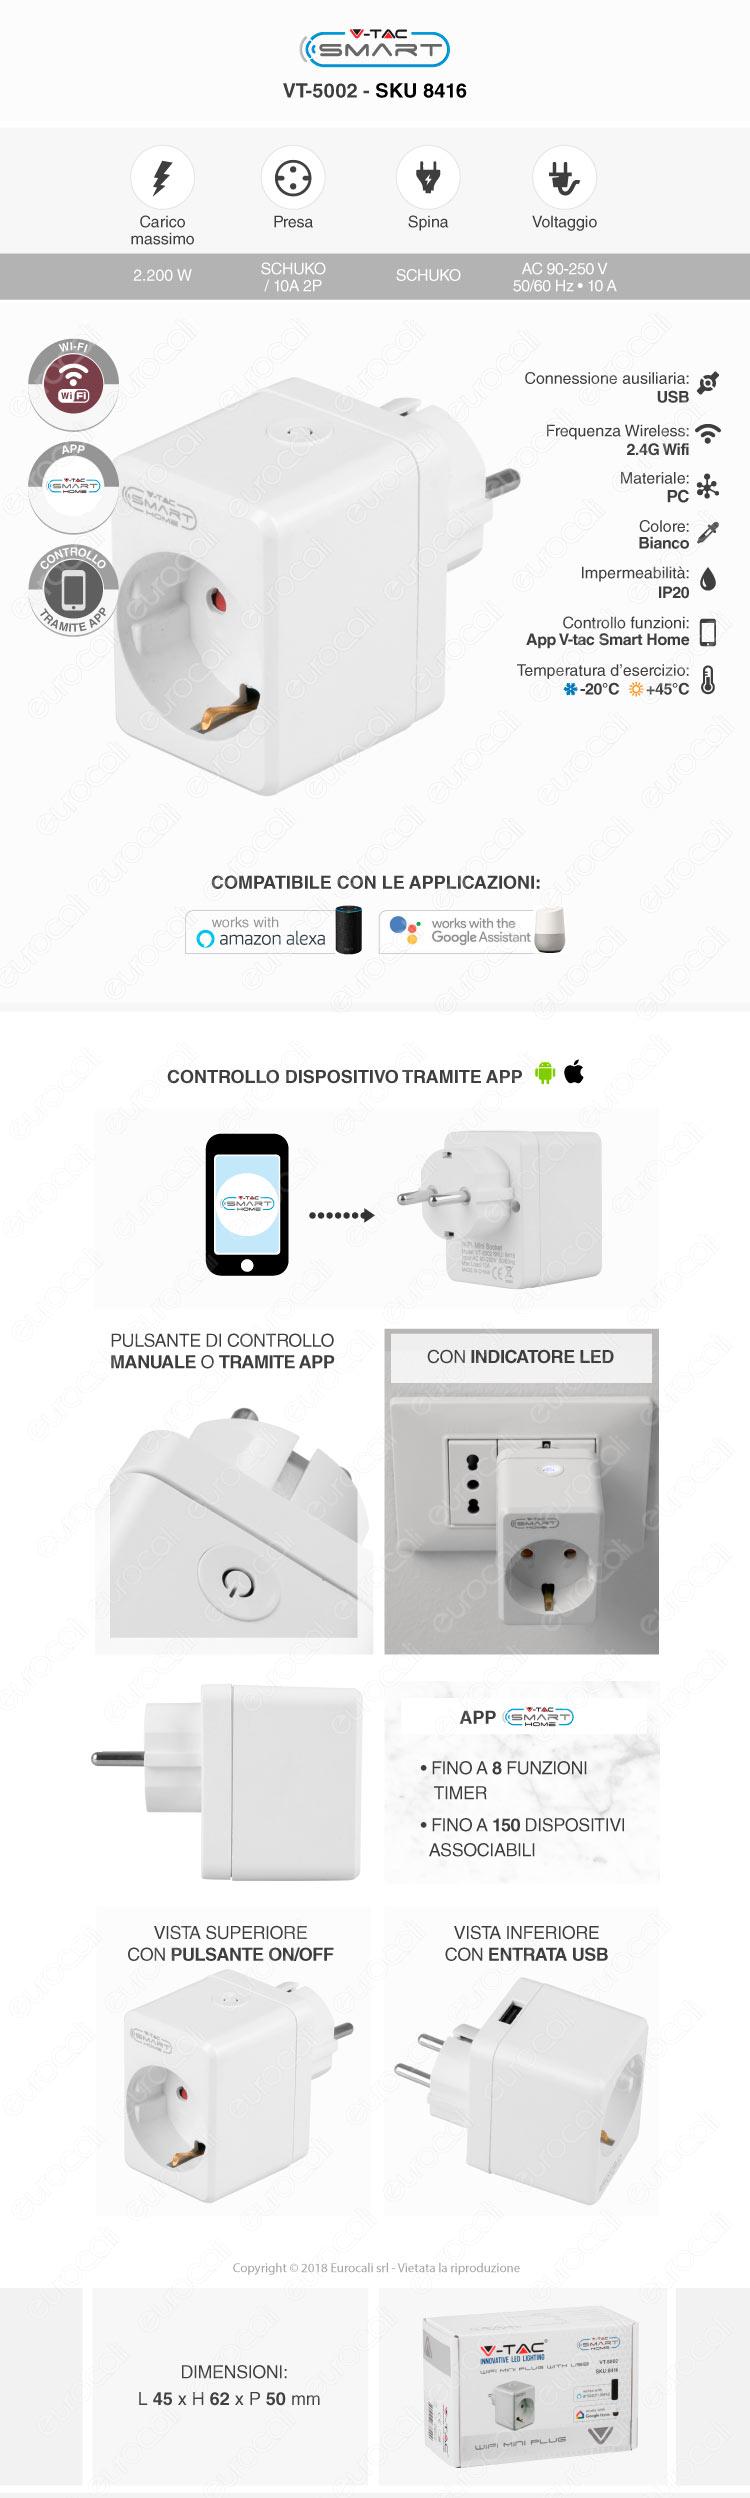 V-Tac Smart VT-5002 Presa 10A Schuko e USB Wi-Fi con Spina Schuko